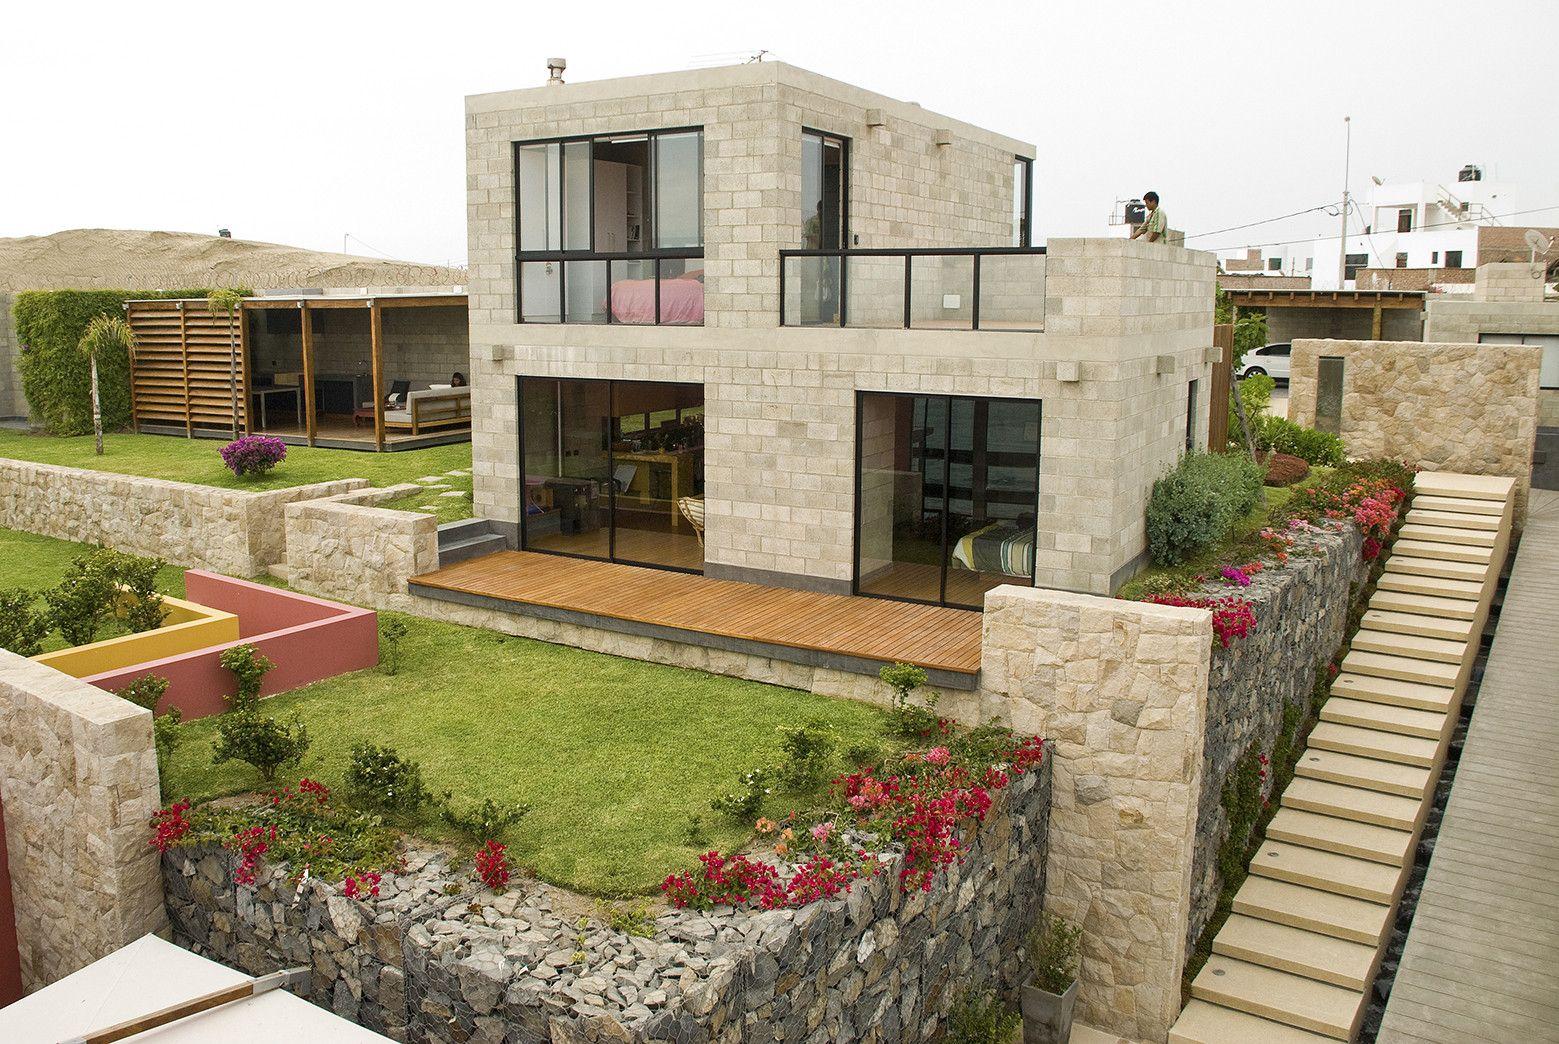 Casa alr vicca verde fachadas de casas constru o de for Casa minimalista lima